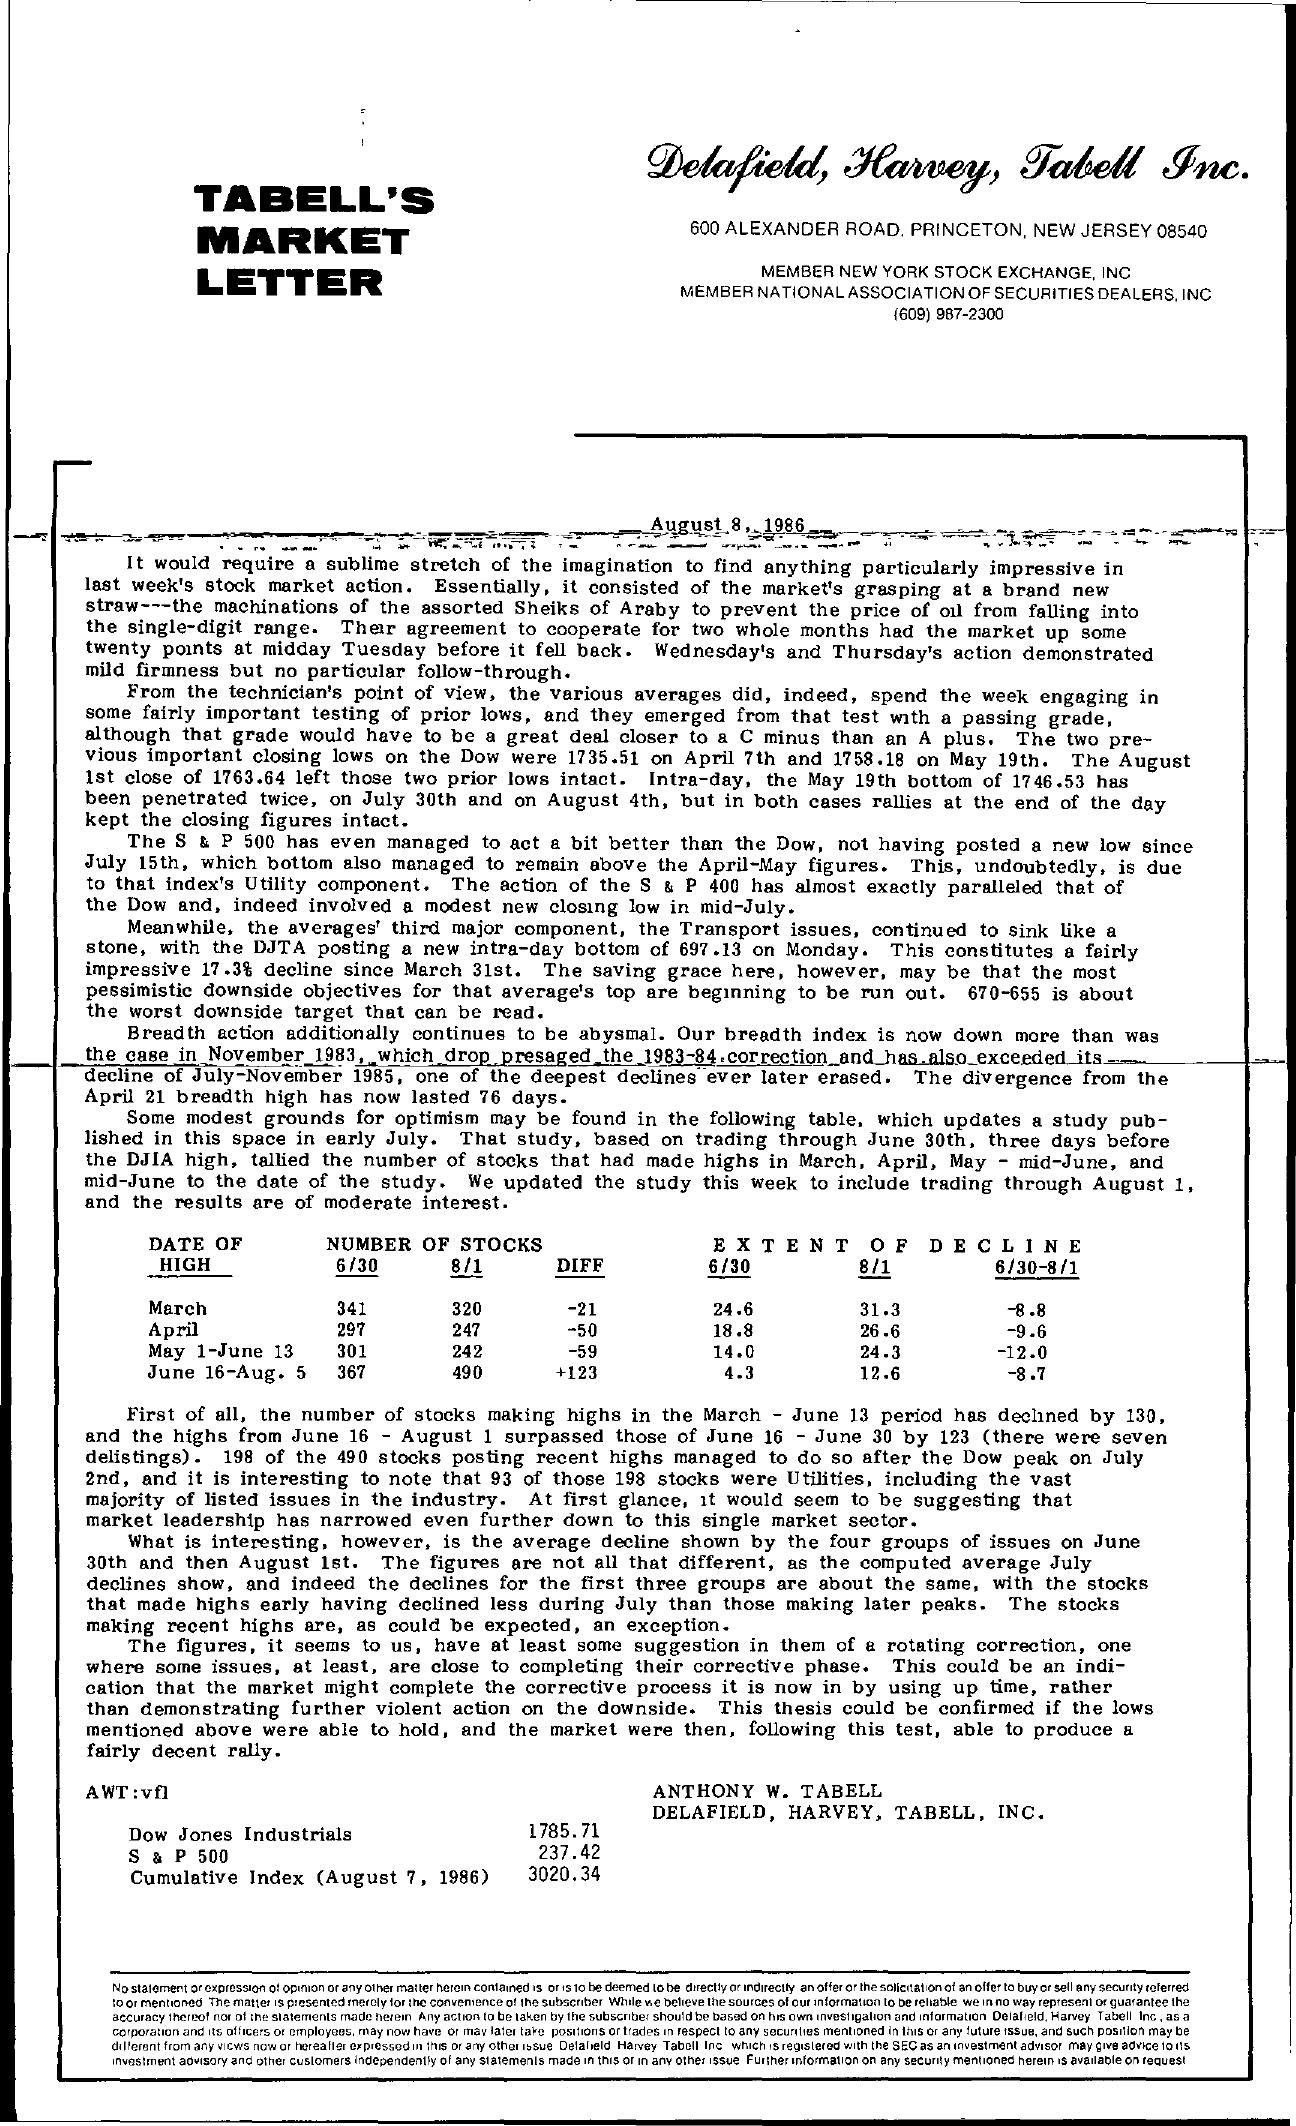 Tabell's Market Letter - August 08, 1986